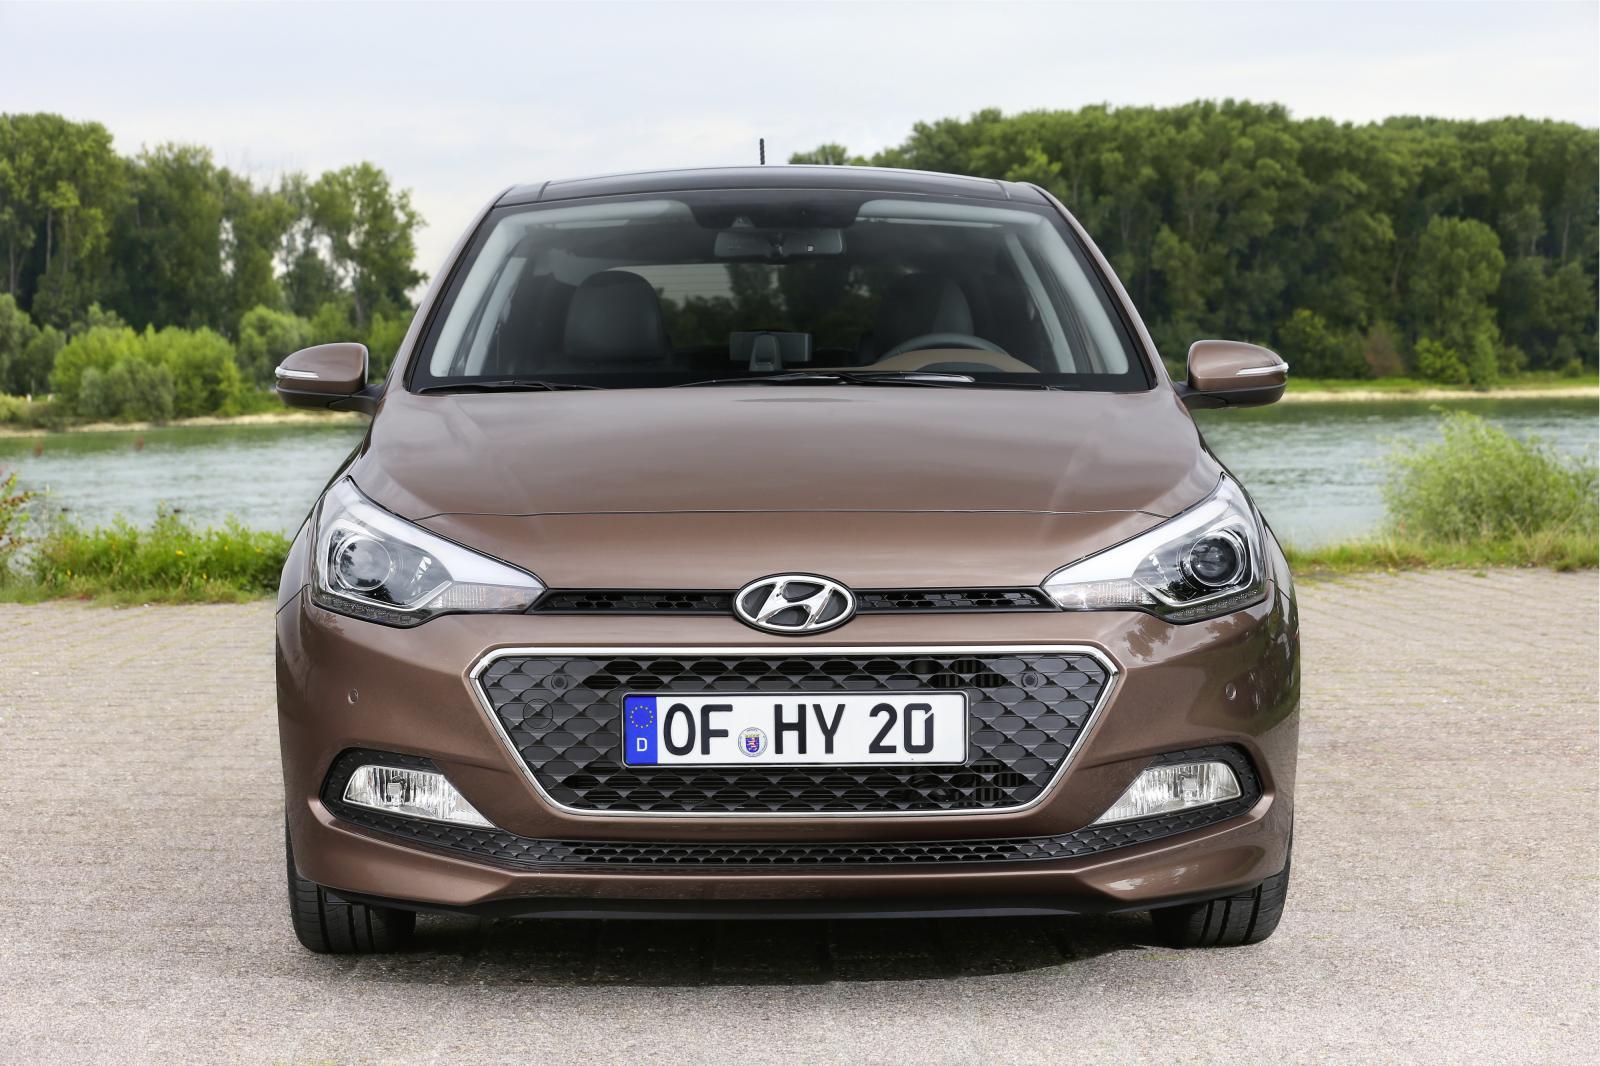 2015 Hyundai i20 Europe press shot front